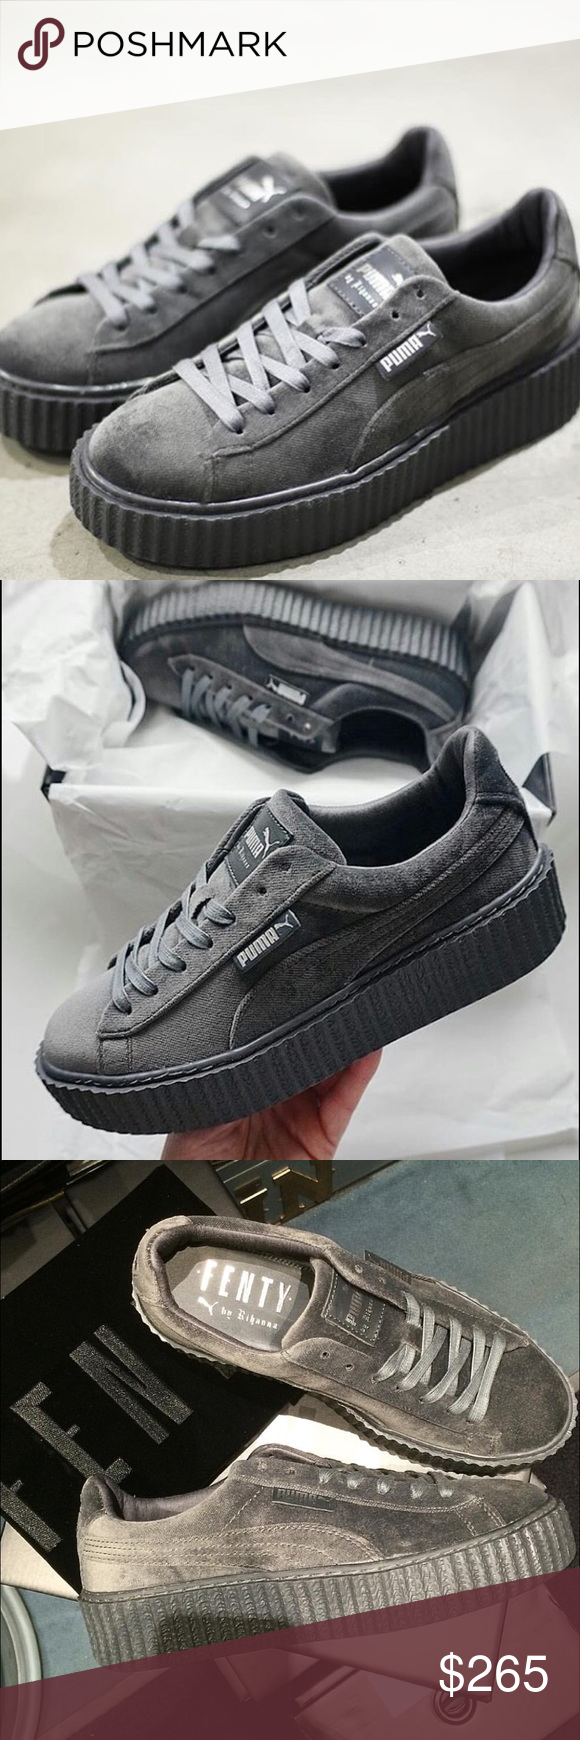 b68c0690f6a Rihanna s Puma x Fenty Glacier Grey Creepers!! These shoes dropped on 12 8